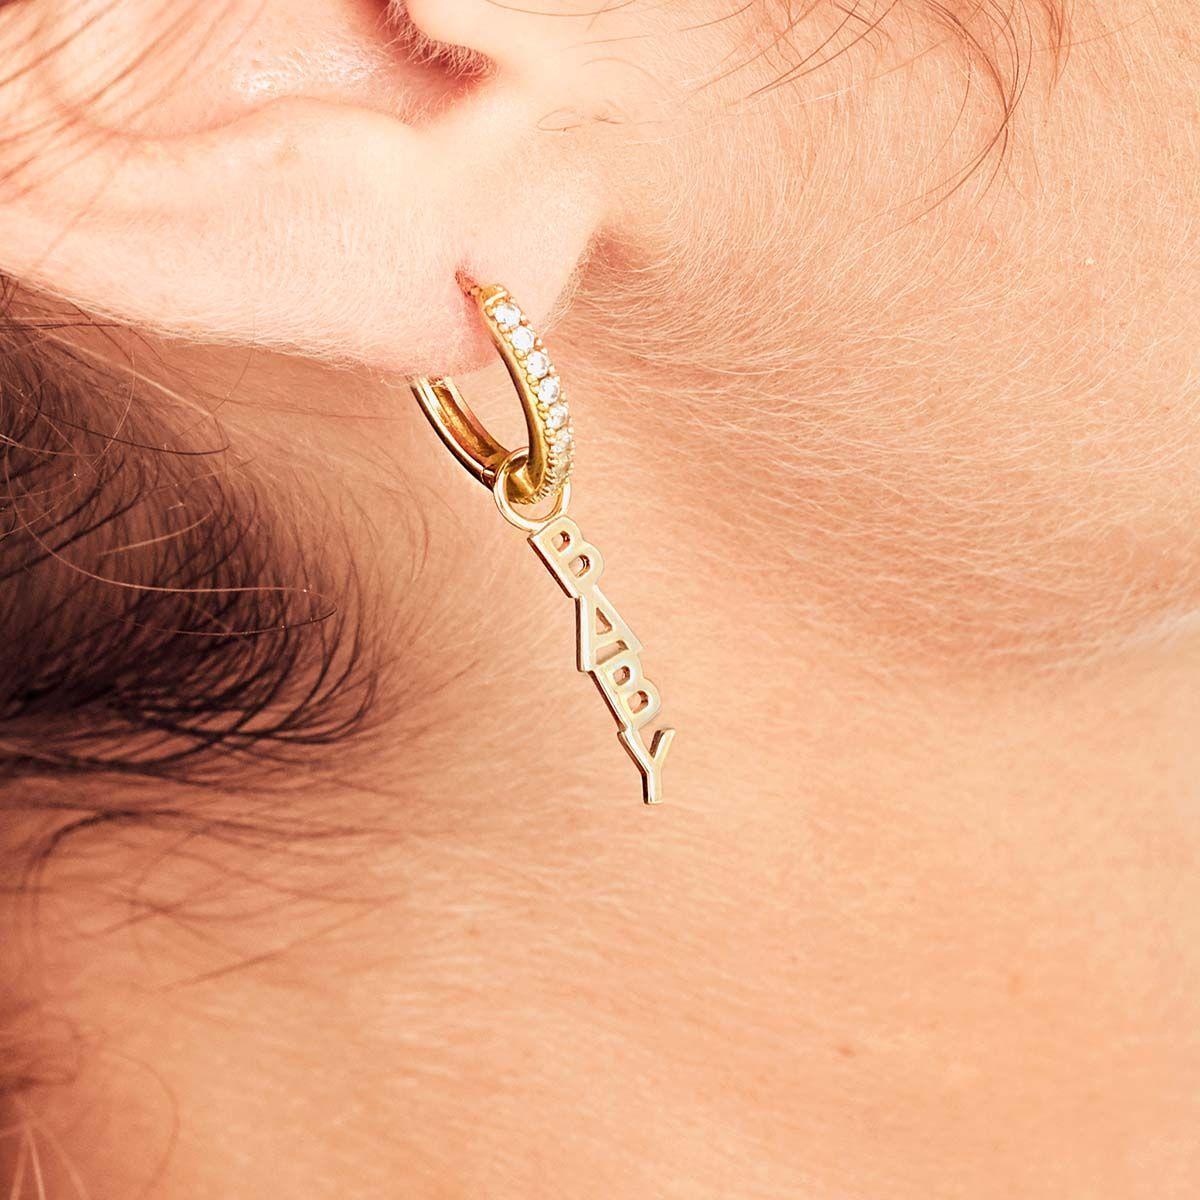 Love Choker - Gold - Ohrring Anhänger - 18k vergoldet